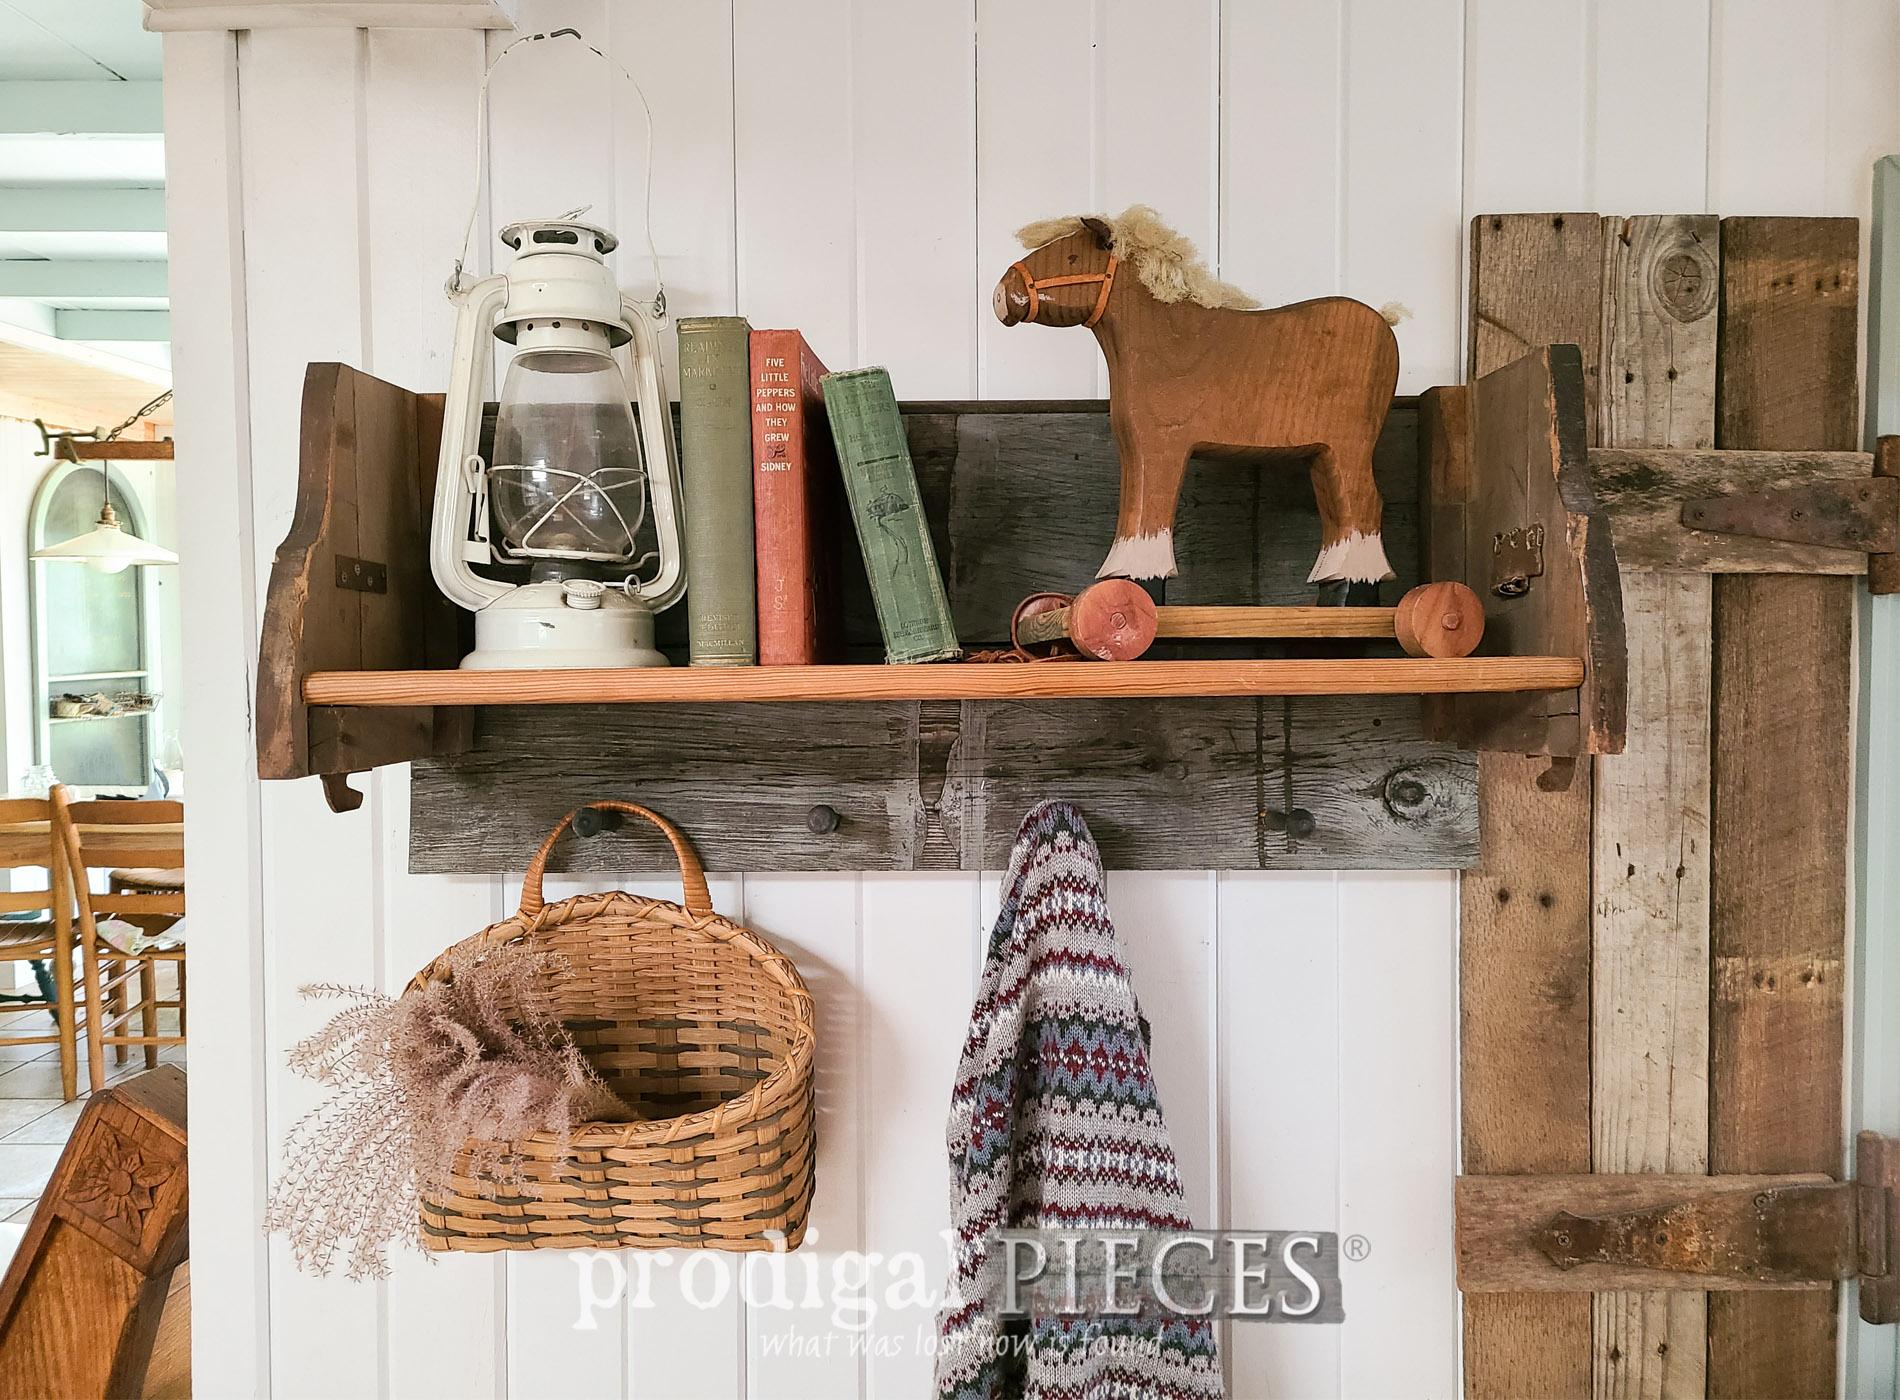 Featured Reclaimed Shelf Rack built by Larissa of Prodigal Pieces | prodigalpieces.com #prodigalpieces #diy #farmhouse #home #reclaimed #homedecor